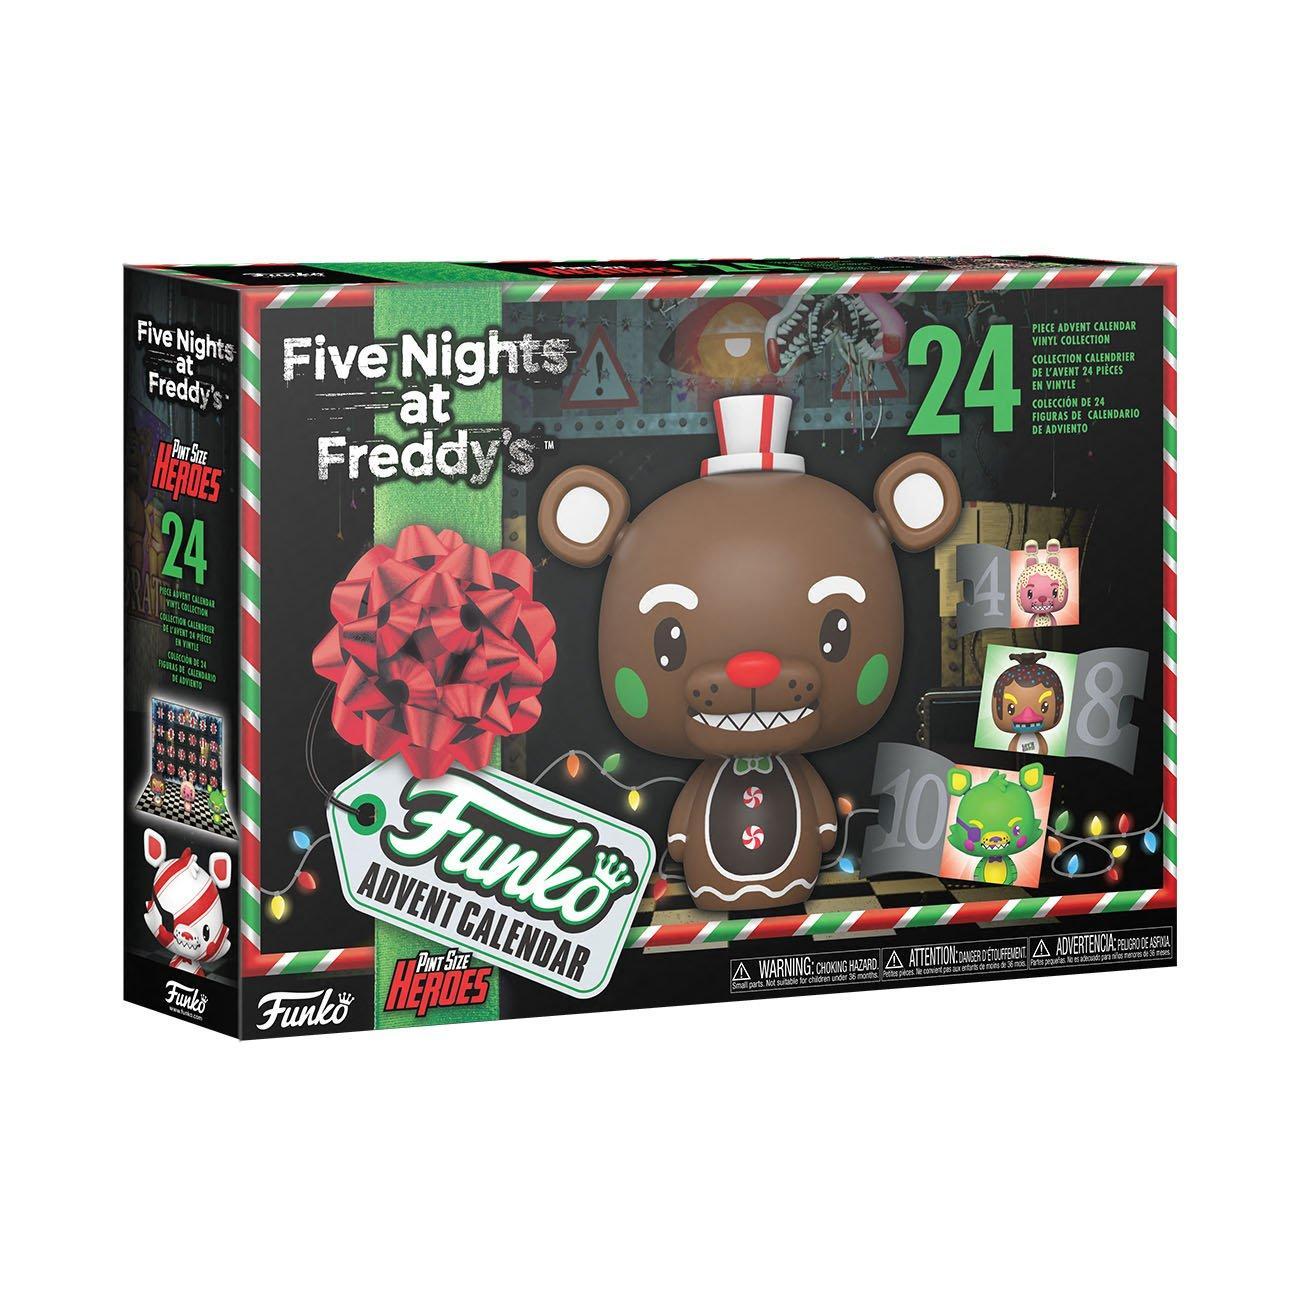 Funko Advent Calendar Five Nights at Freddy's Blacklight 2021 Countdown Calendar